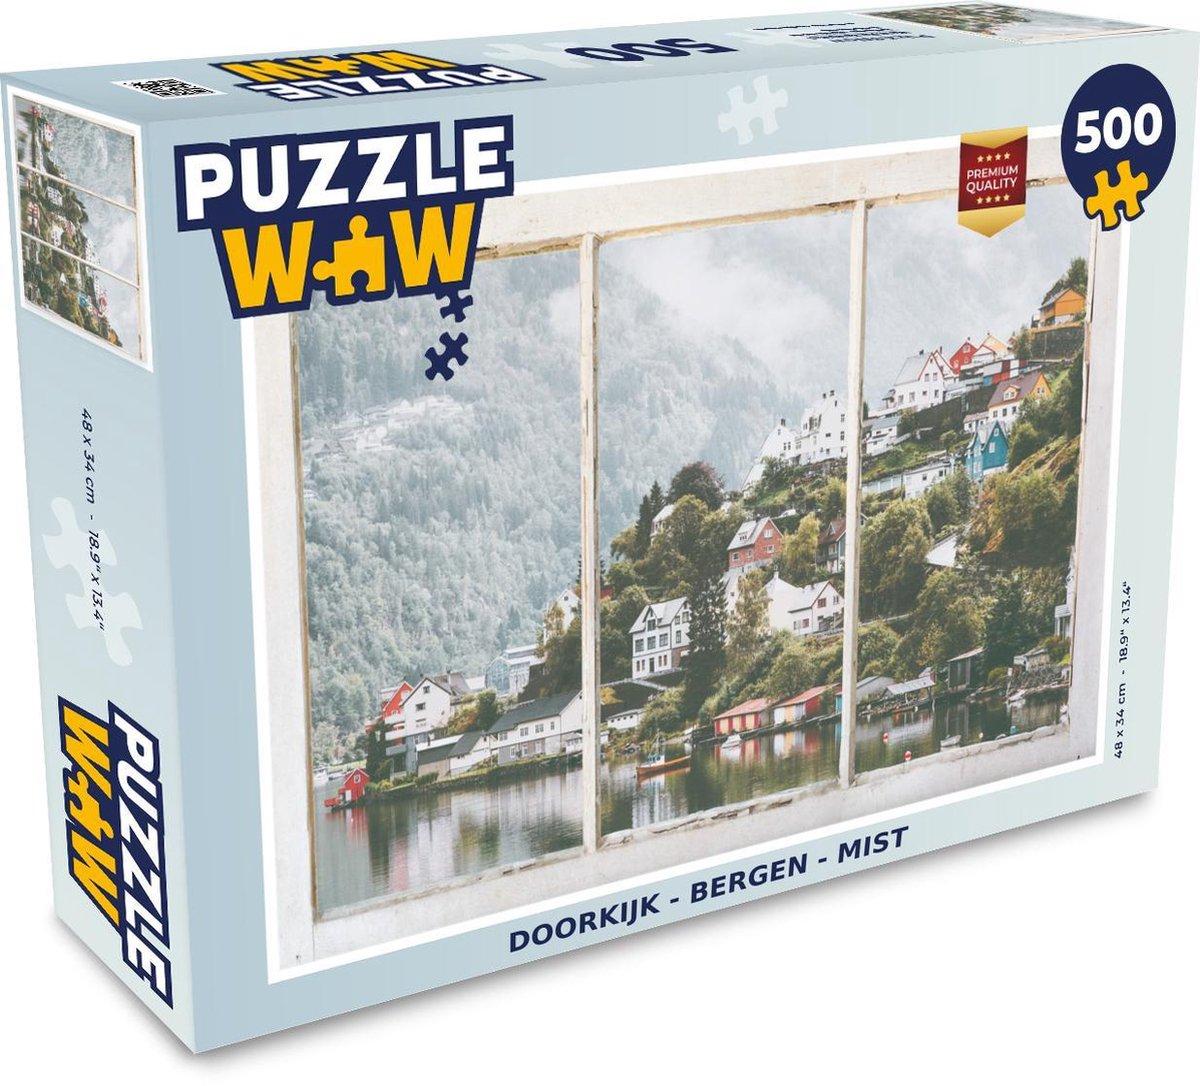 Puzzel Doorkijk - Berg - Mist - Legpuzzel - Puzzel 500 stukjes